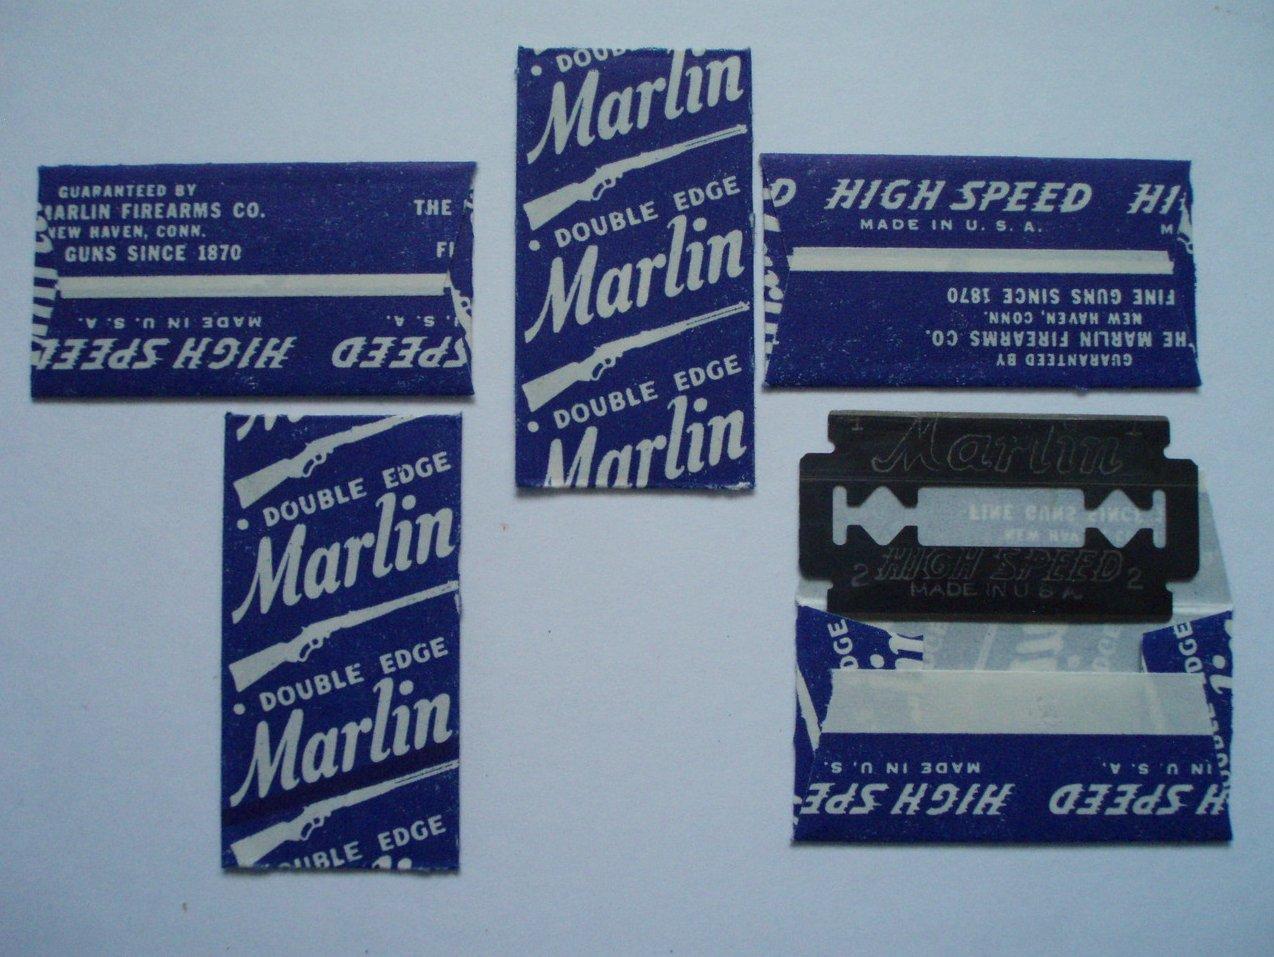 5 Marlin Antique Double Edged Razor Blades original wrapper